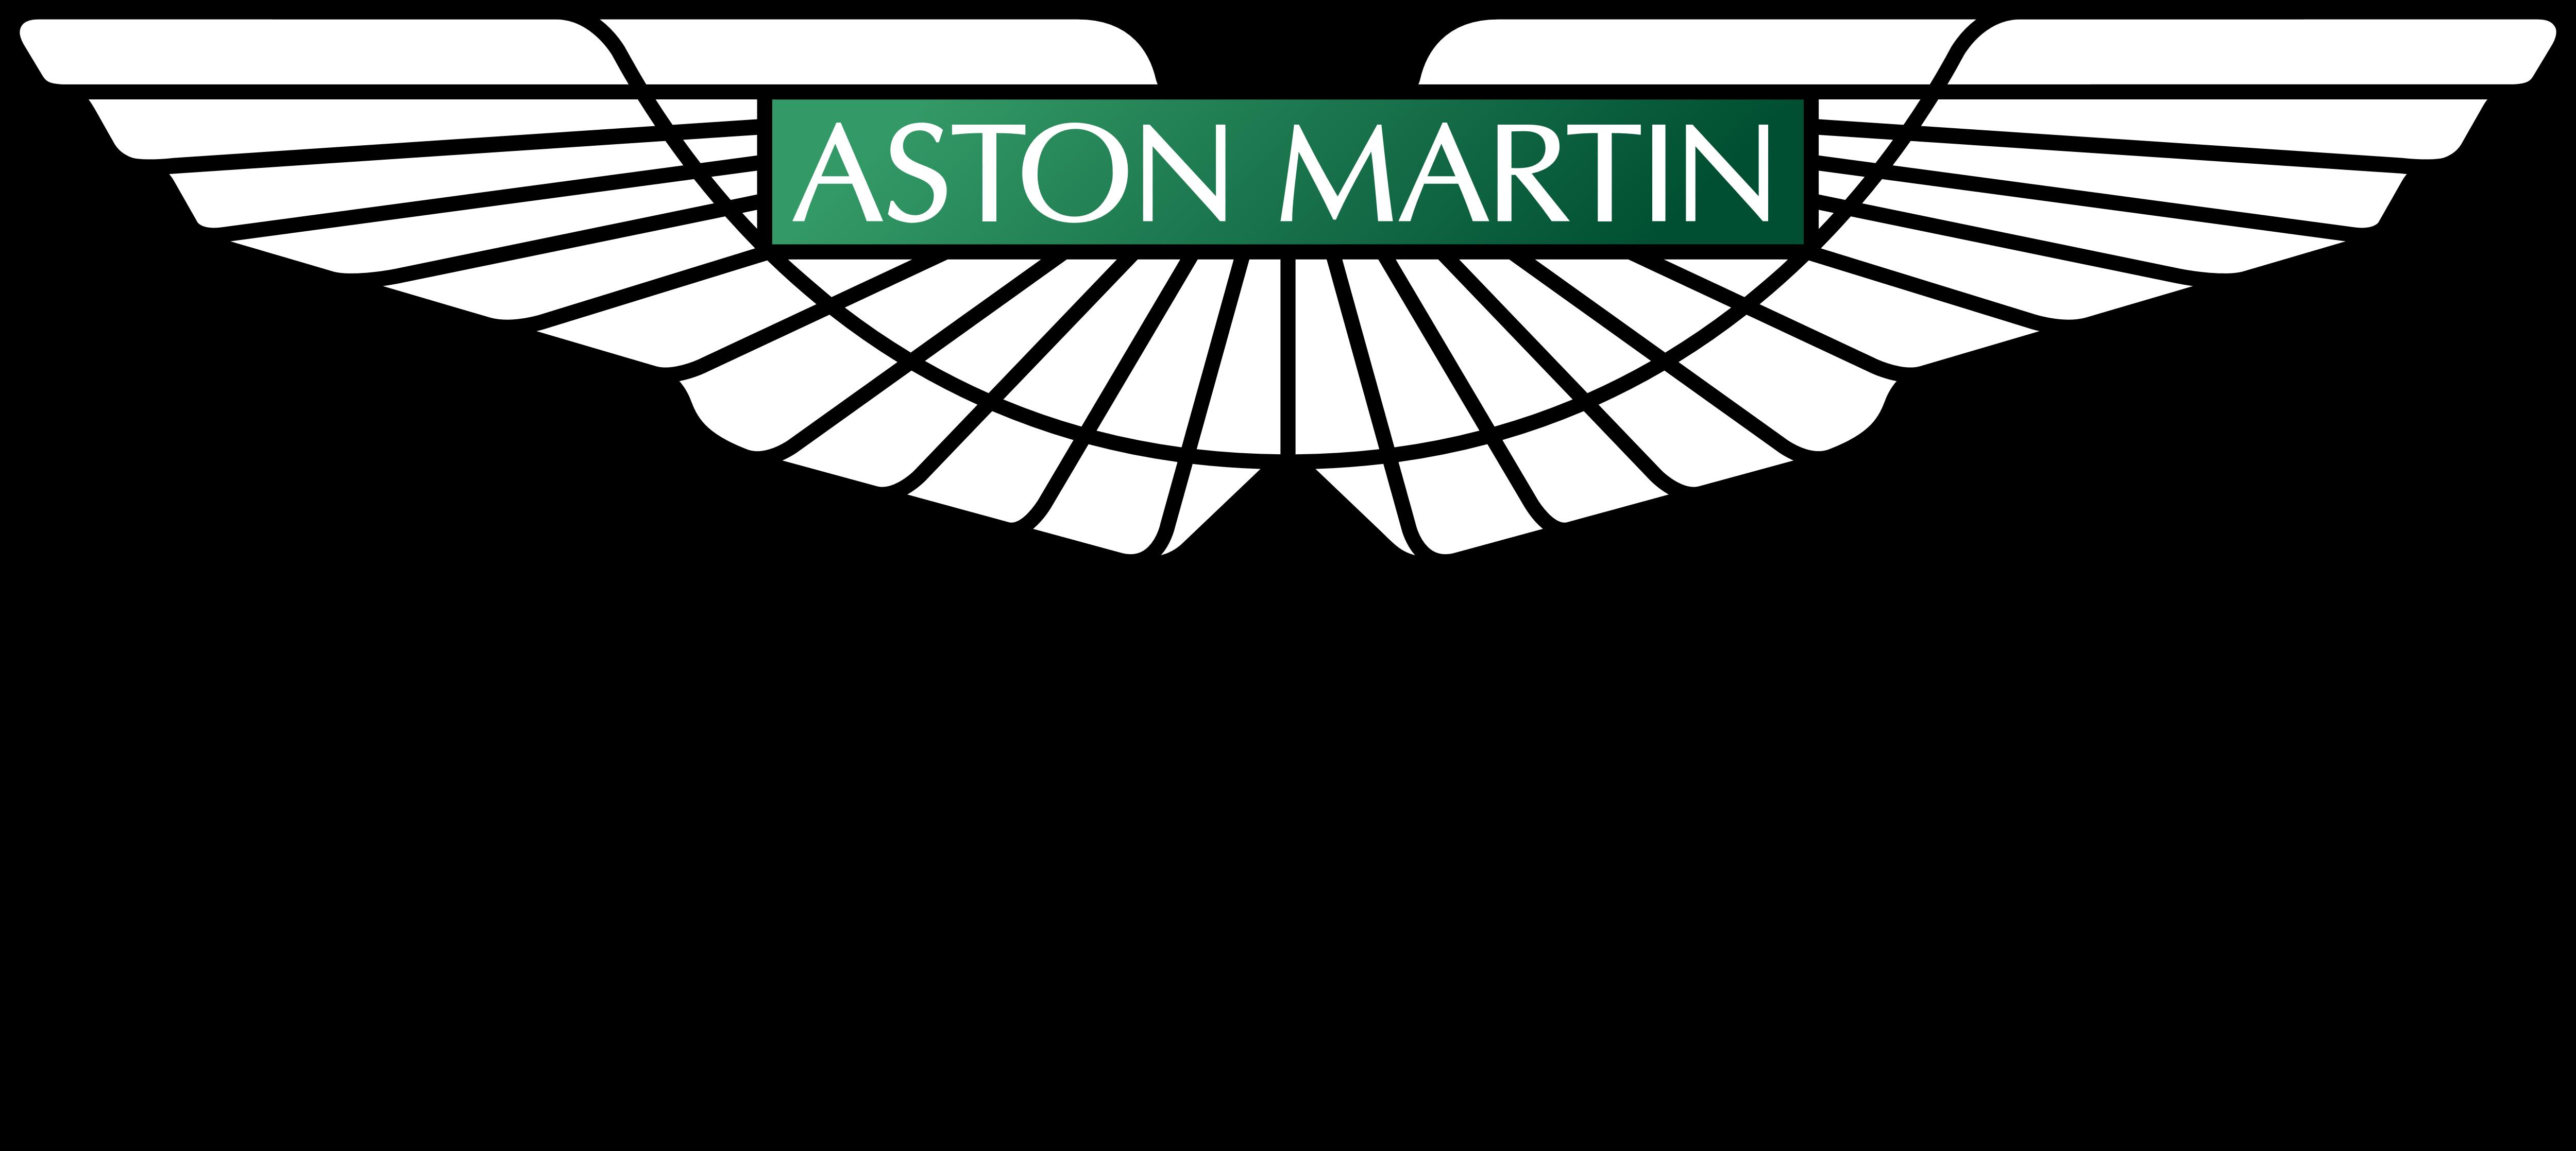 dorobienie kluczyka Aston martin romeo